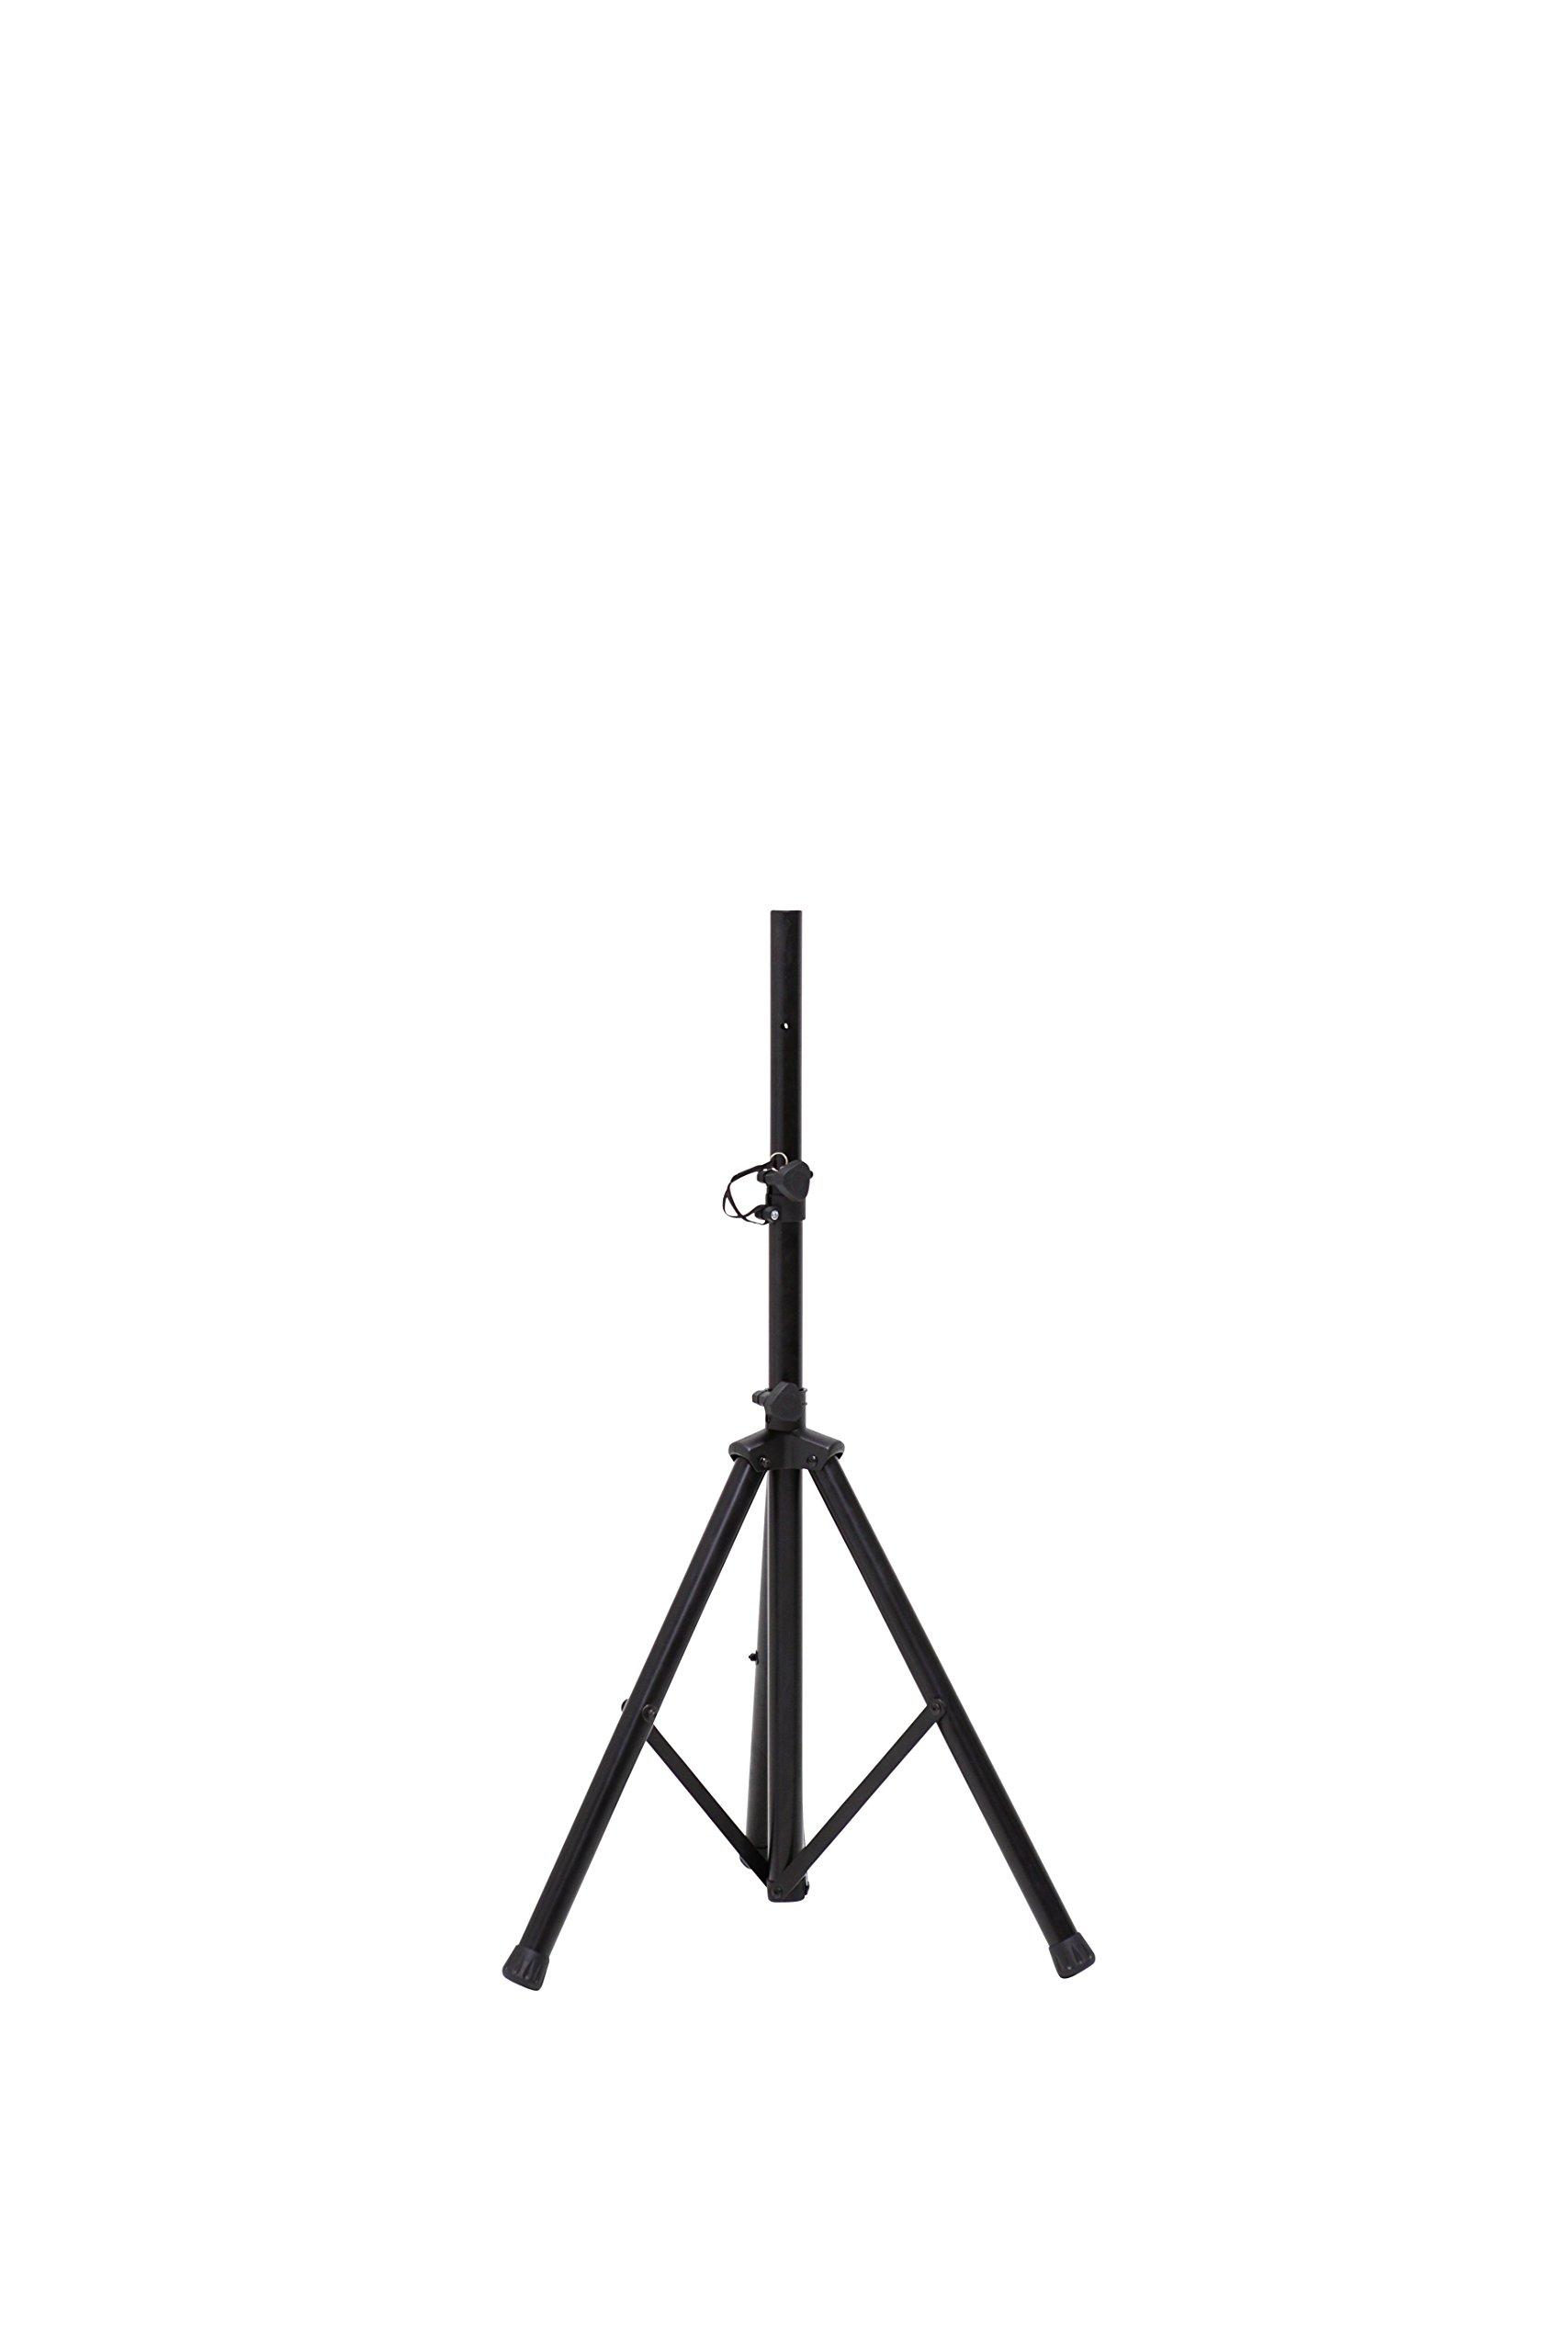 Blackmore BJST-60KG DJ Speaker Stand 60kg Weight Capacity by Blackmore